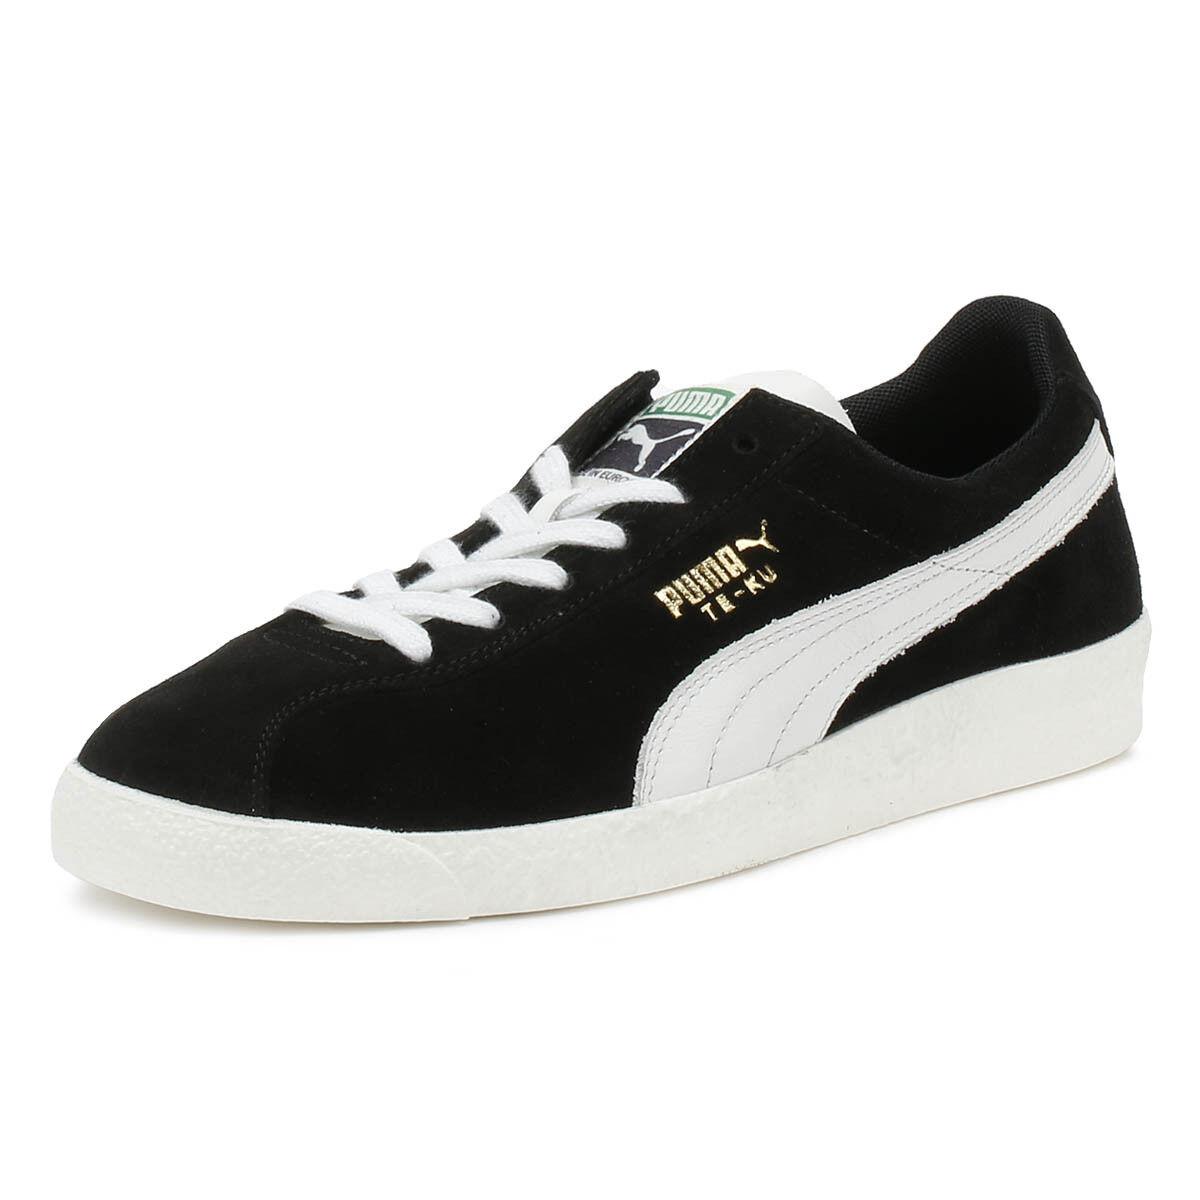 Puma Para Hombres Zapatillas Te-Ku Prime Negro Gamuza Sport Casual Zapatos Con Cordones